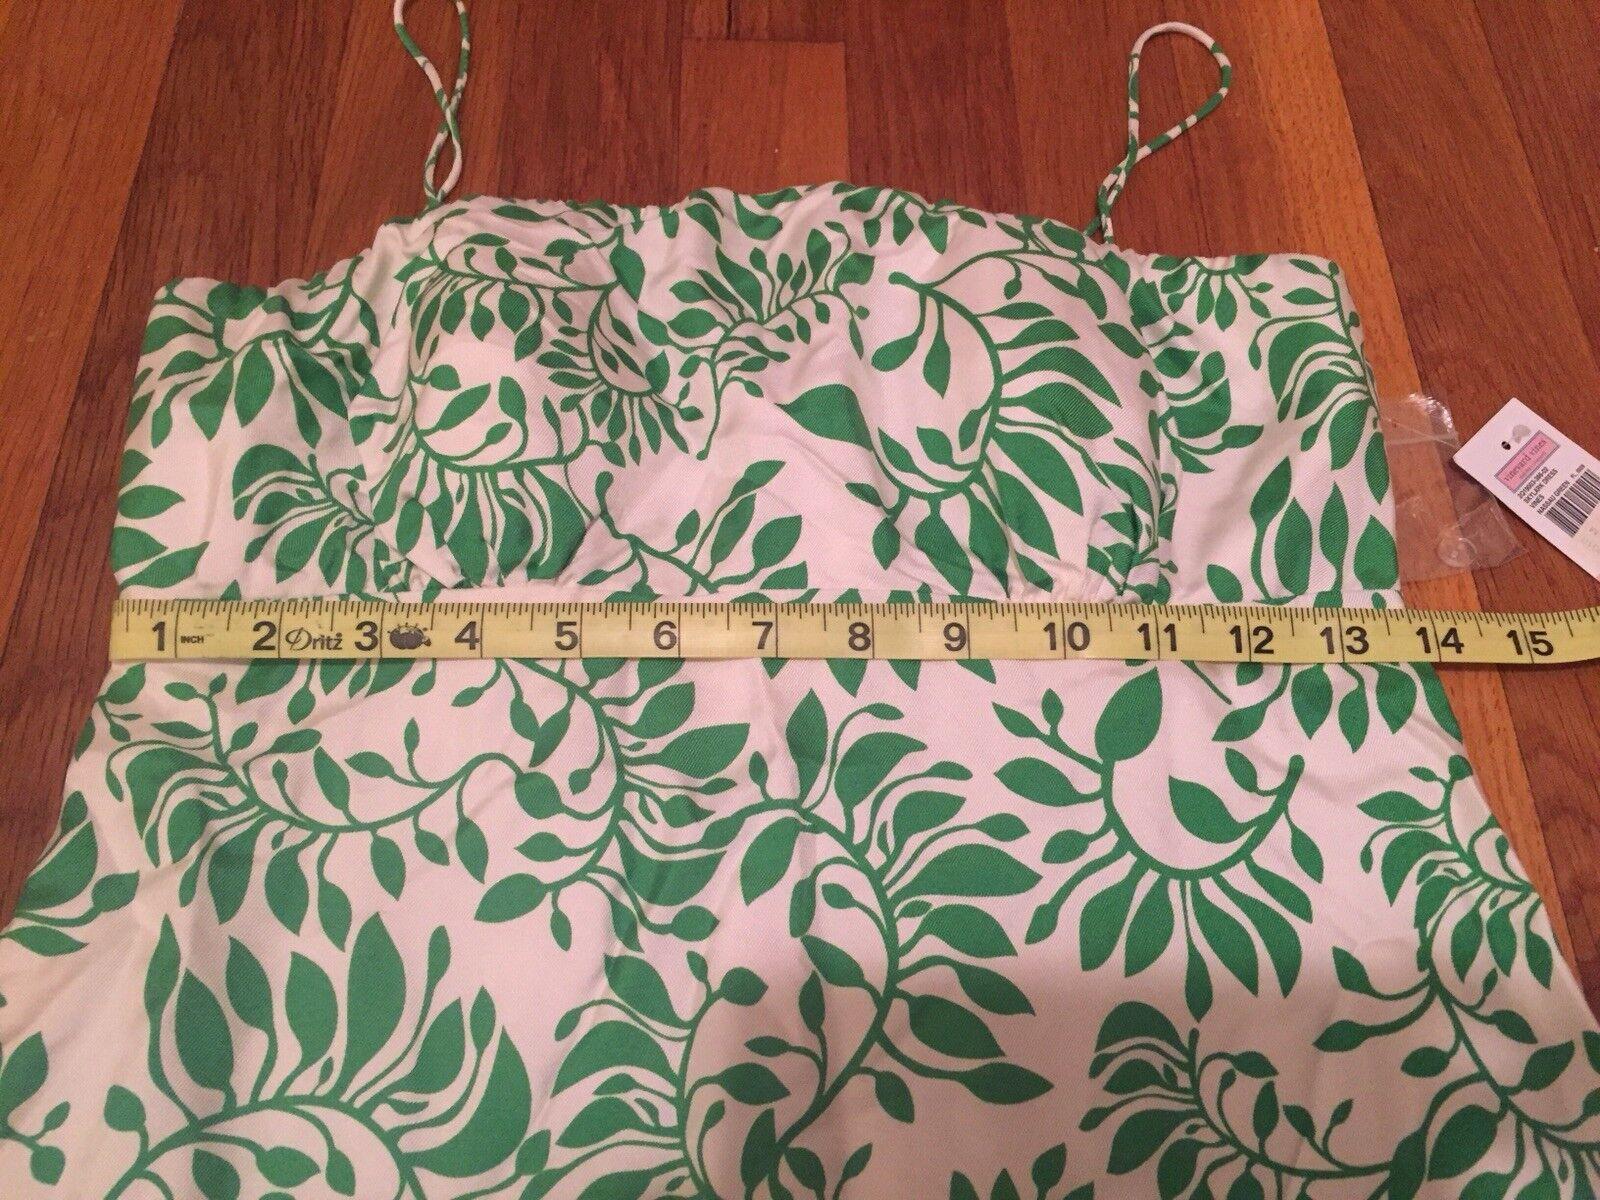 VINEYARD VINES NWT green silk floral dress SZ 2